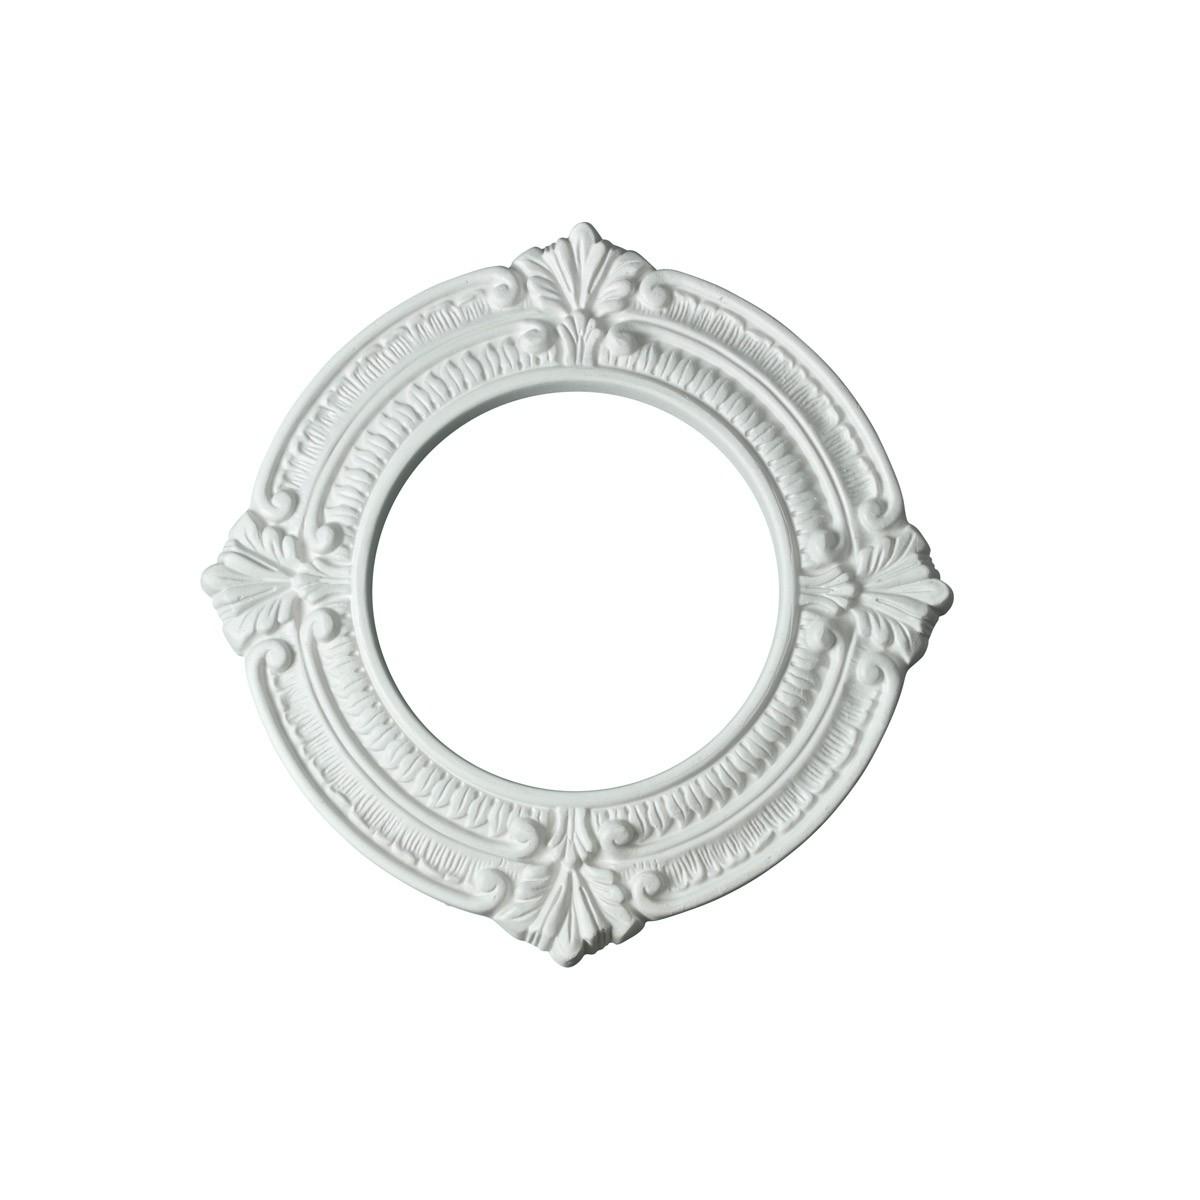 Spot Light Trim Medallions 6 Inch ID Urethane White Set of 10 Ceiling Fixtures Ceiling light fixtures Lighting Medallion